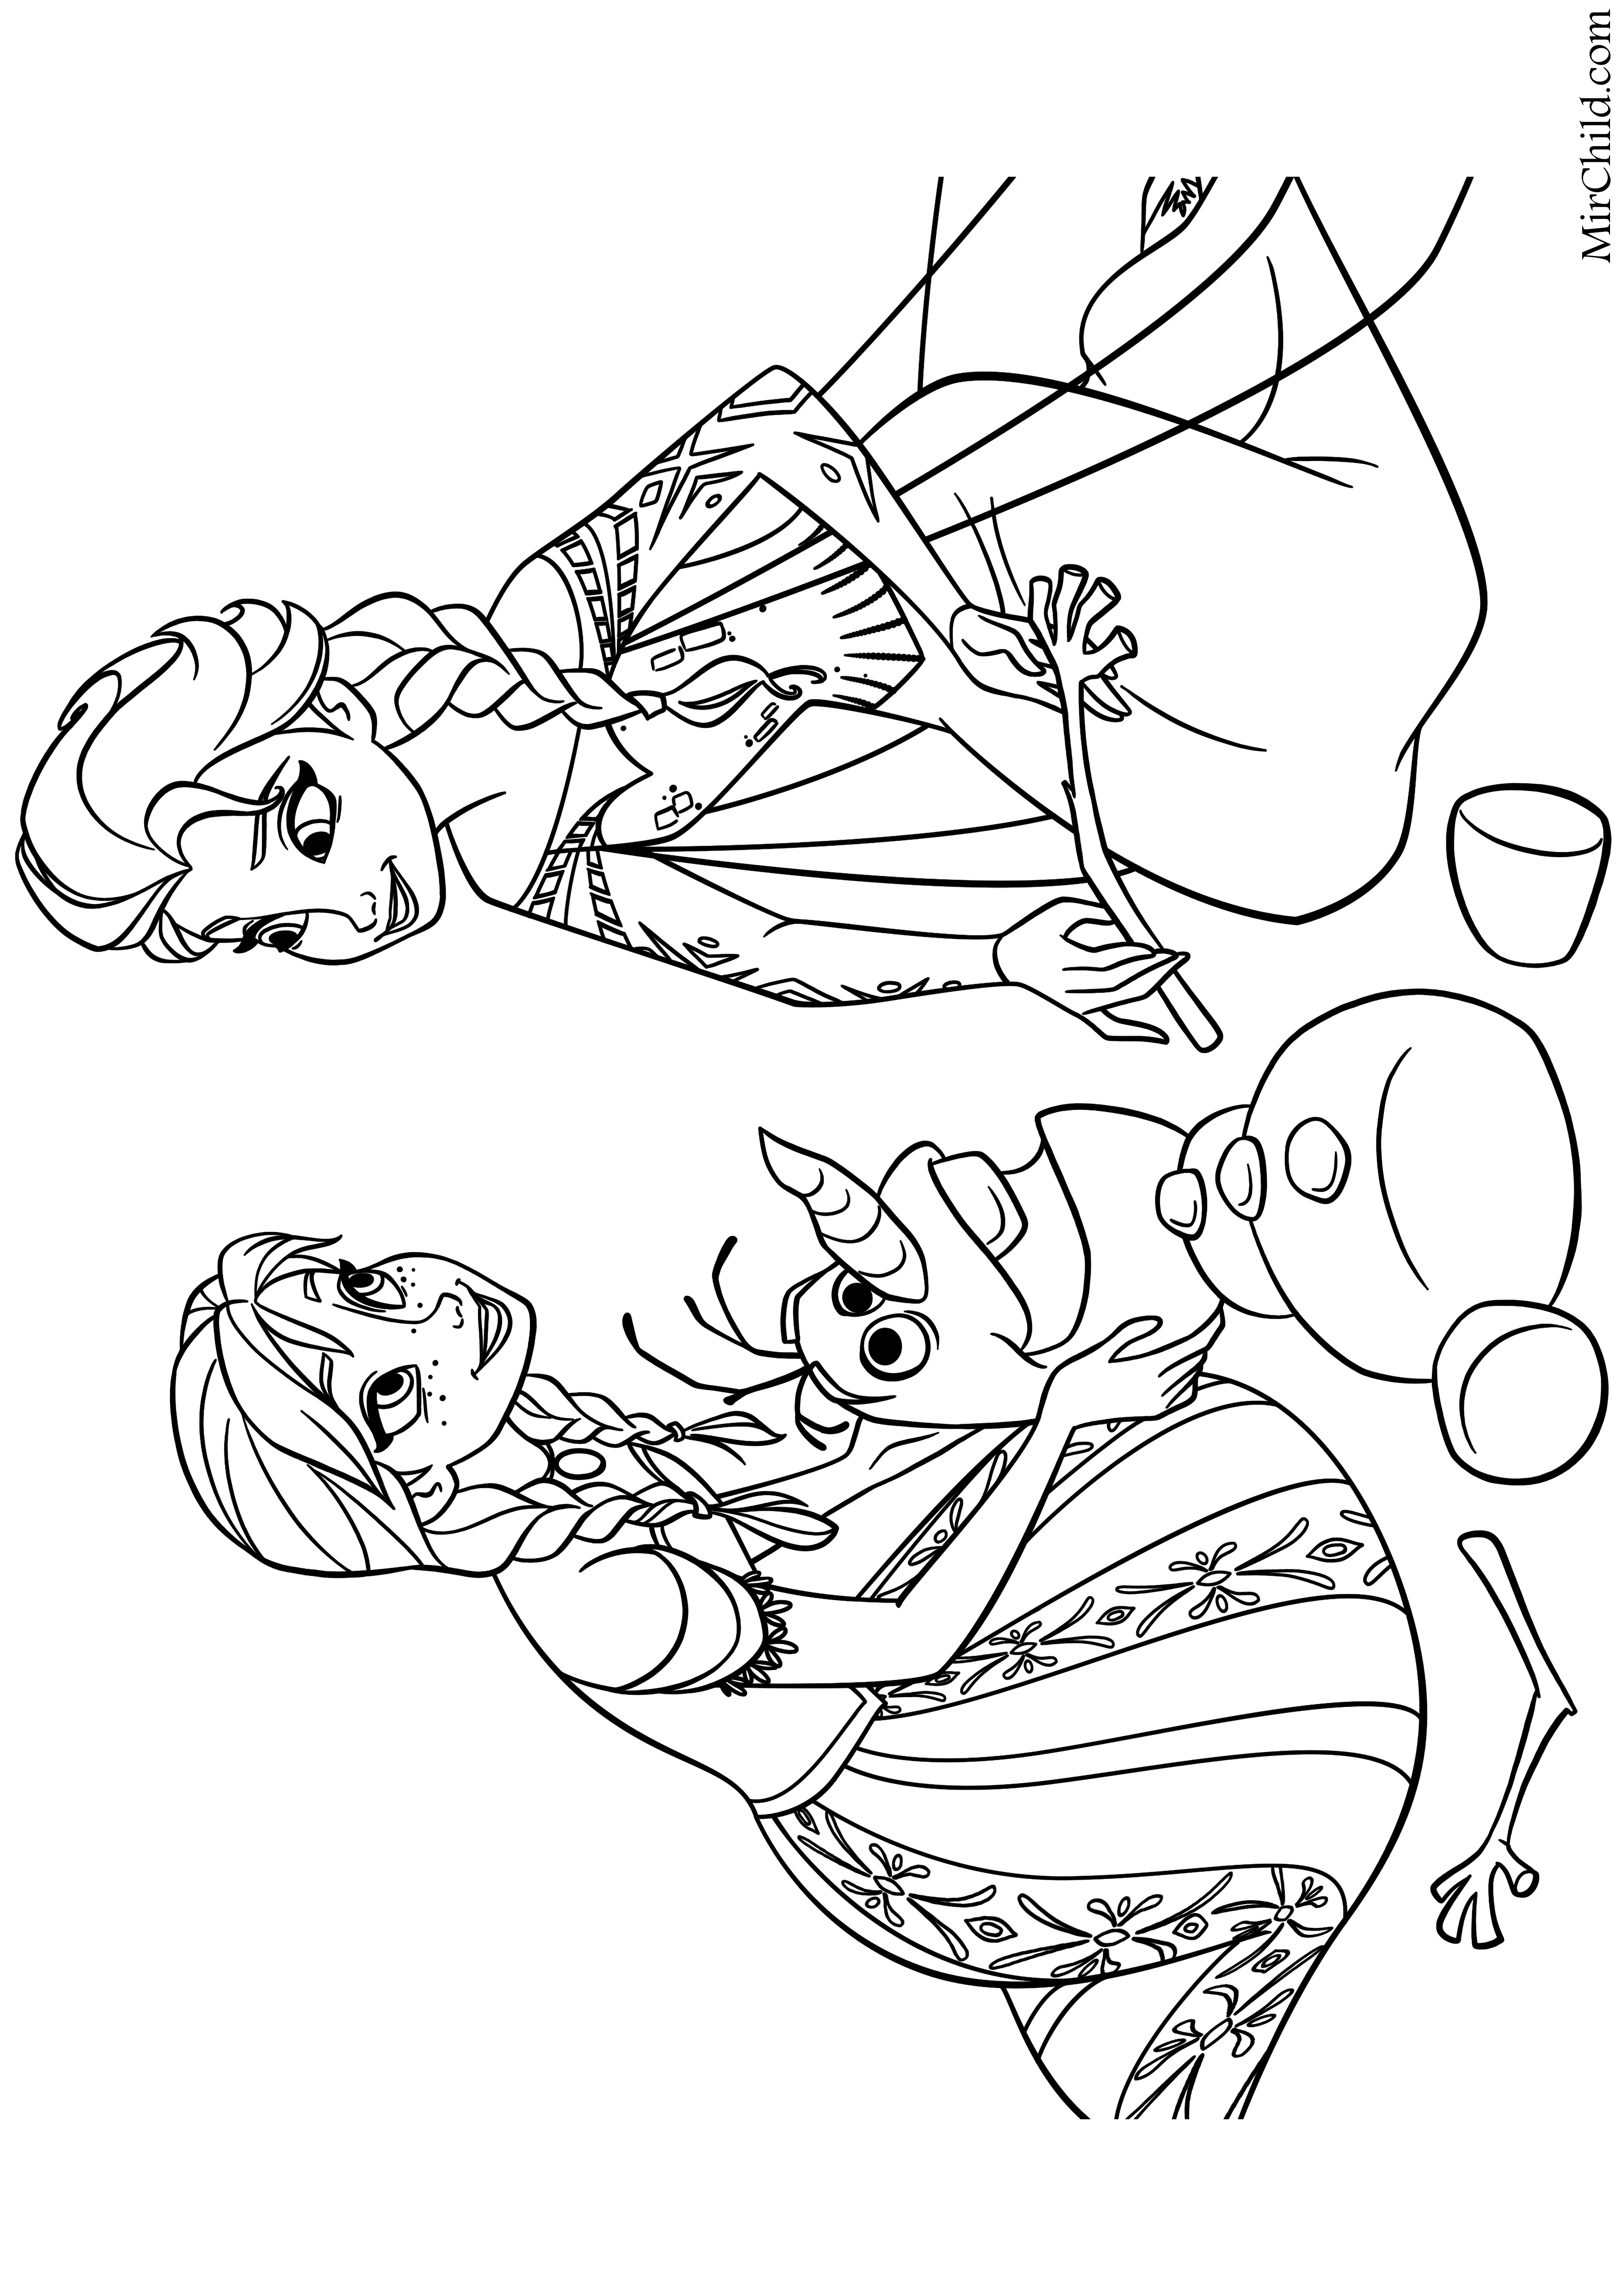 Роботы раскраска 4